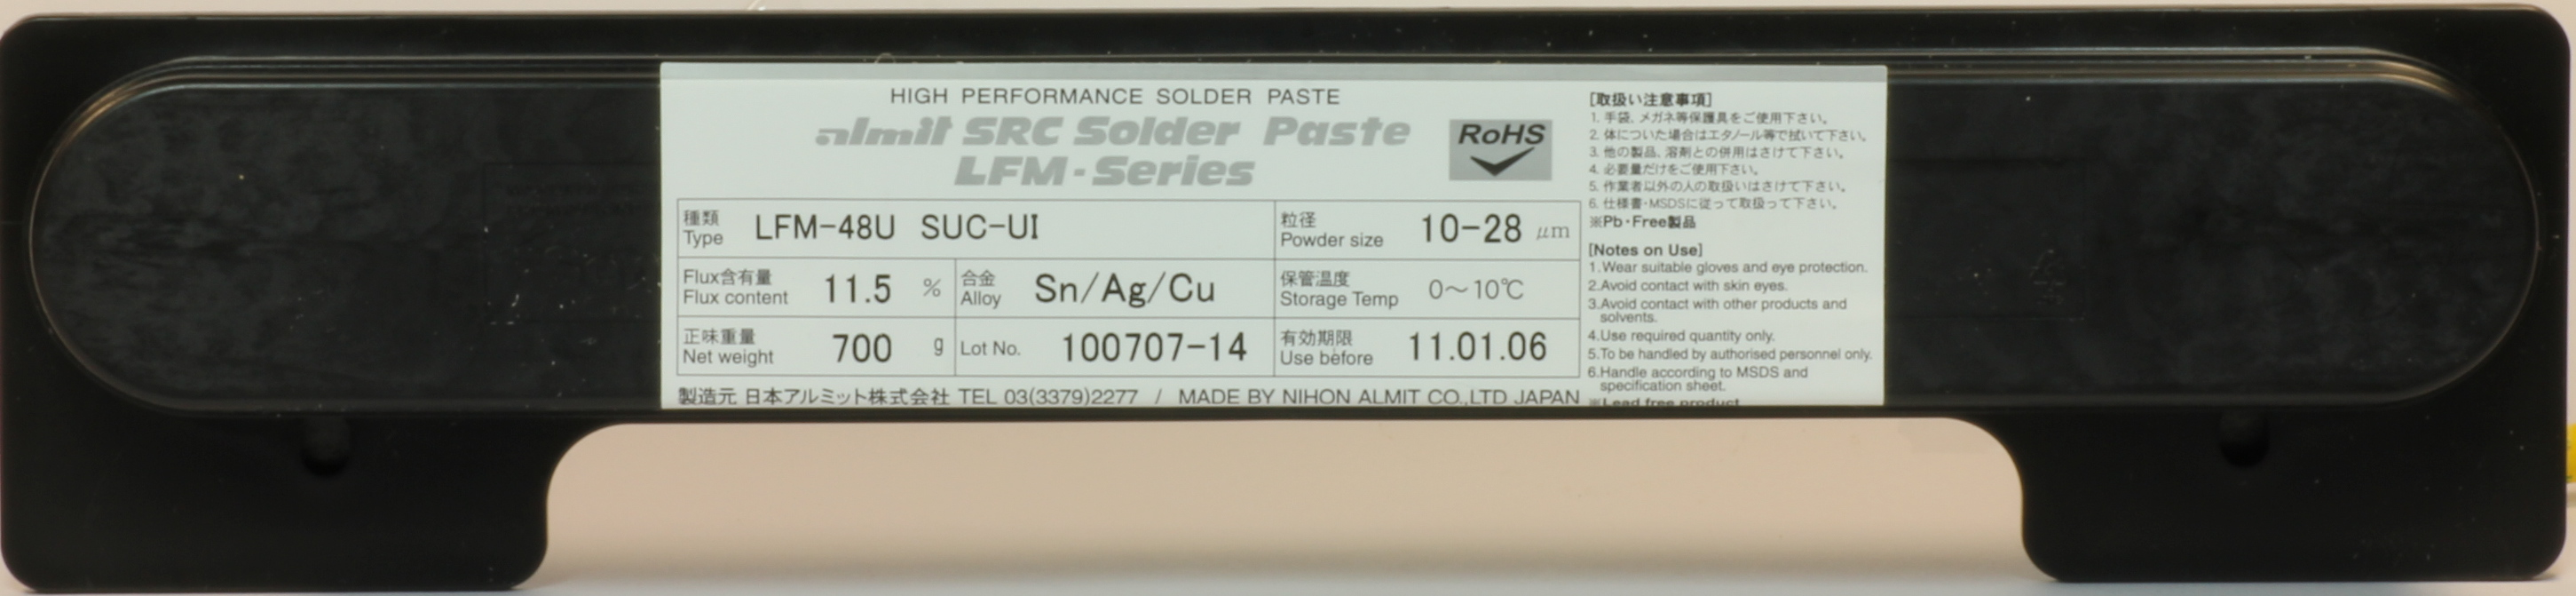 LFM 48W SUC-UI 11,5%  (20-38µ)  0,7kg Proflow